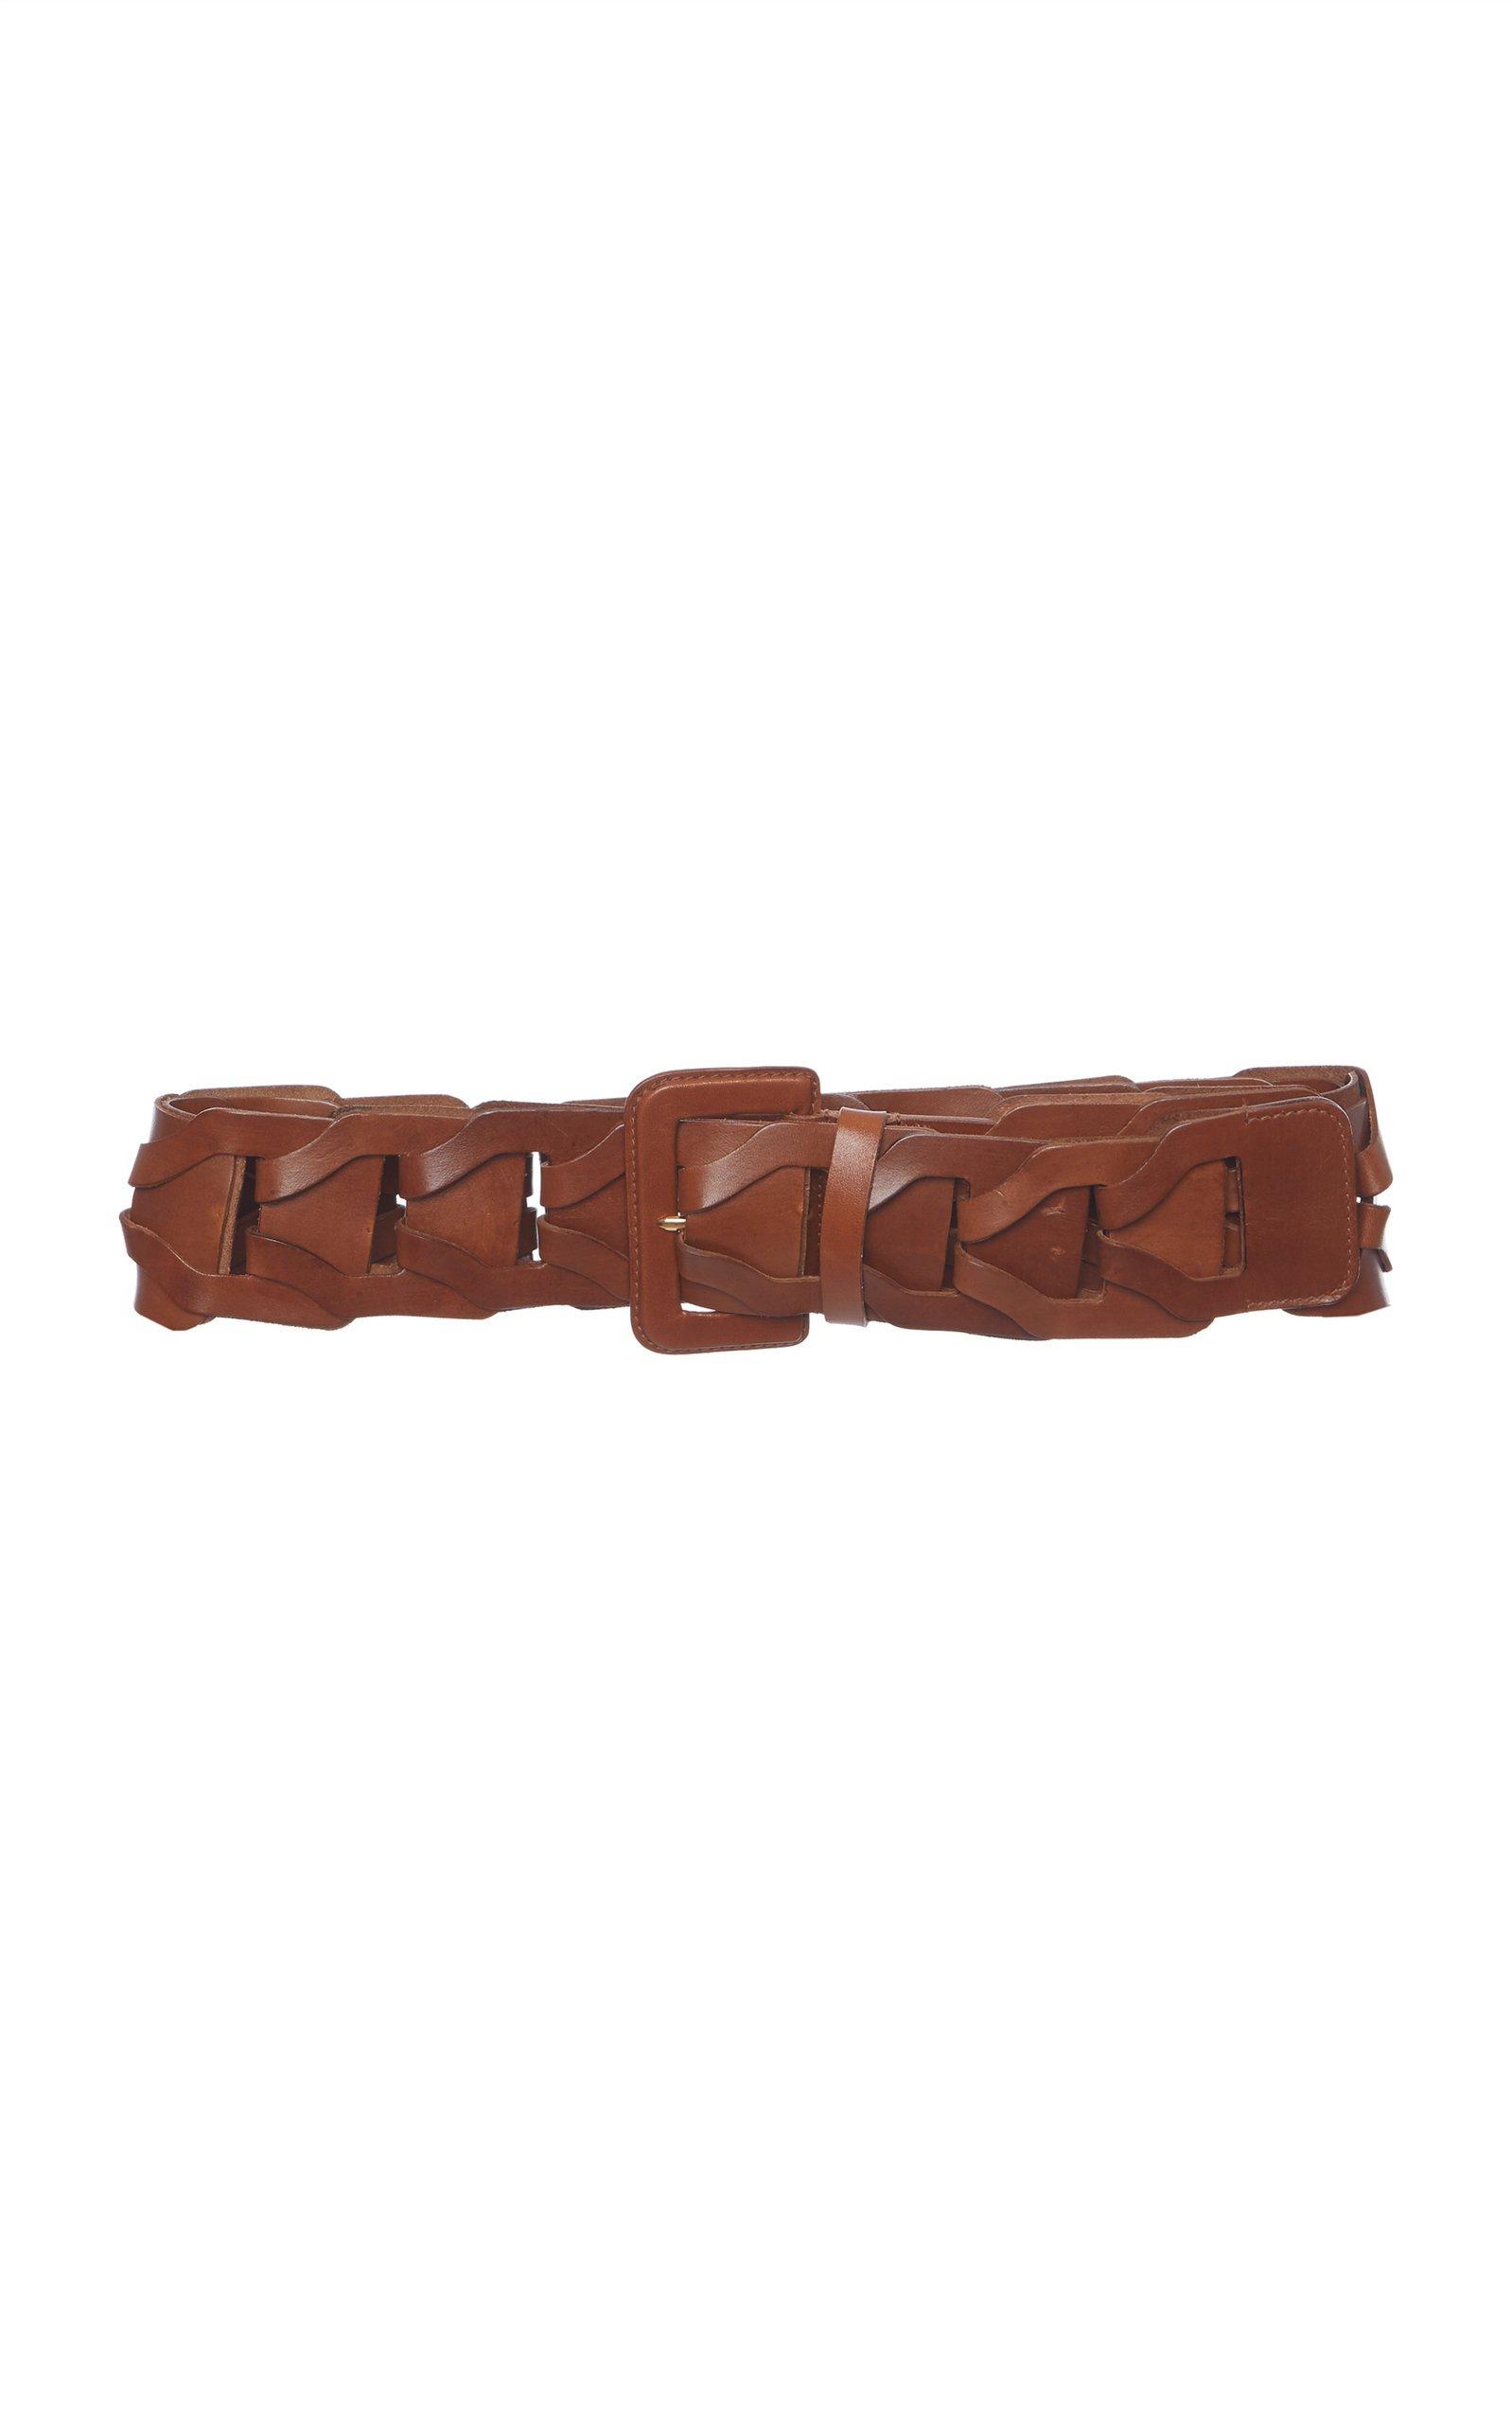 Prada Wide Woven Leather Belt Size: 100 cm